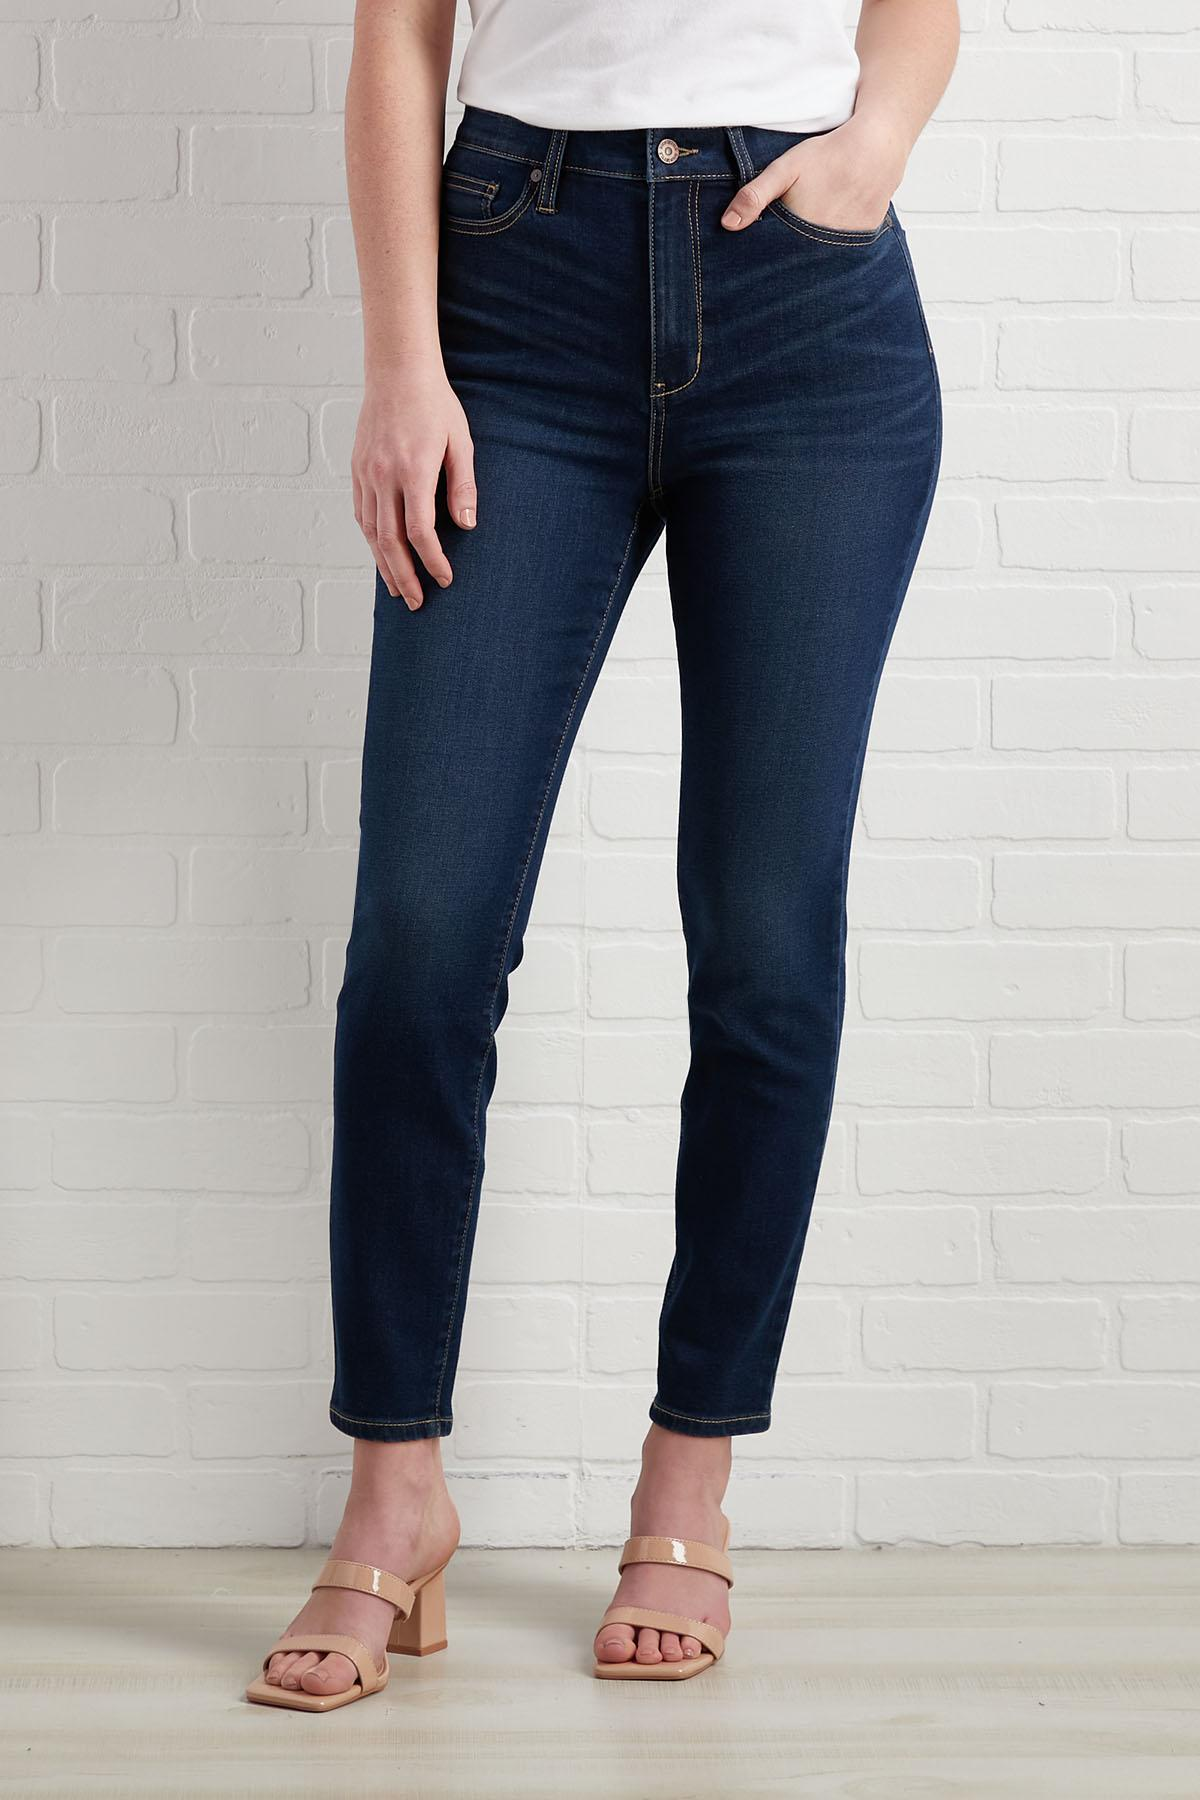 Daily Denim Jeans